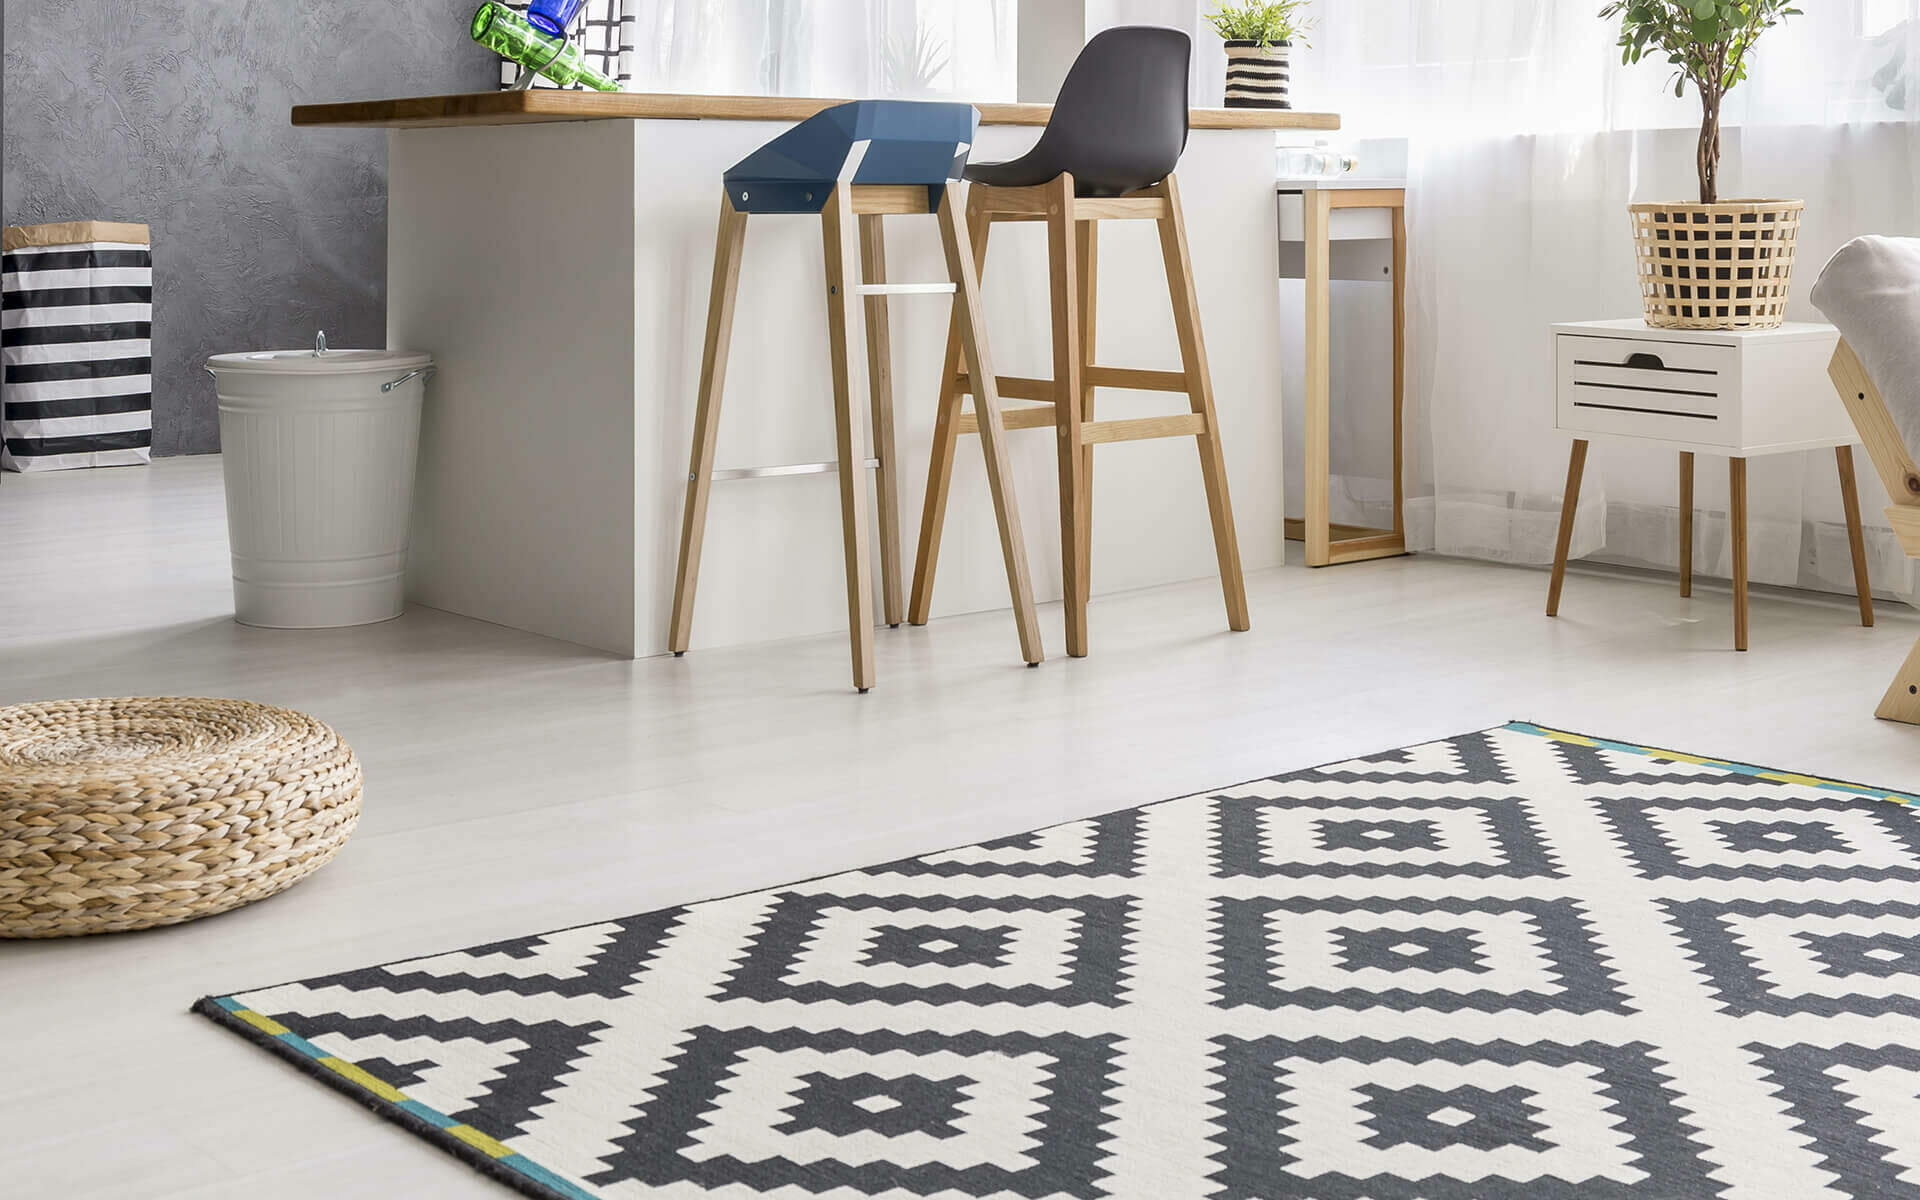 Tile to Carpet Transition